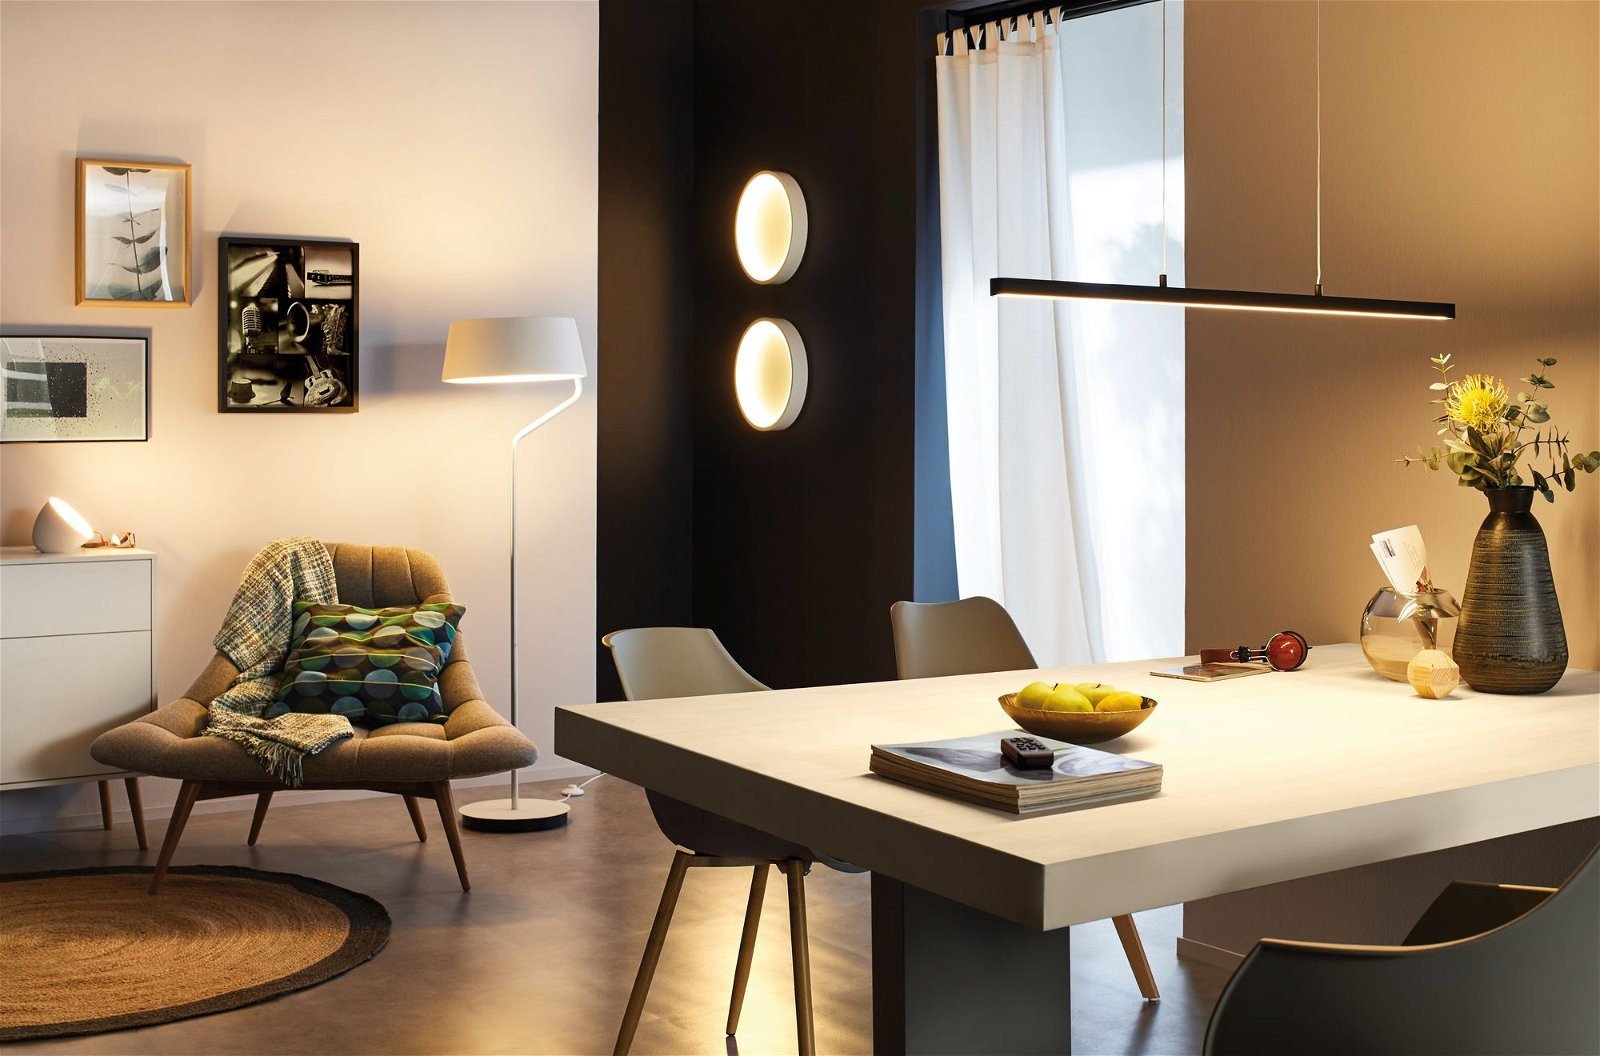 Staande LED-lamp Smart Home Bluetooth Belaja RGBW 900lm 8W Wit/Chroom mat